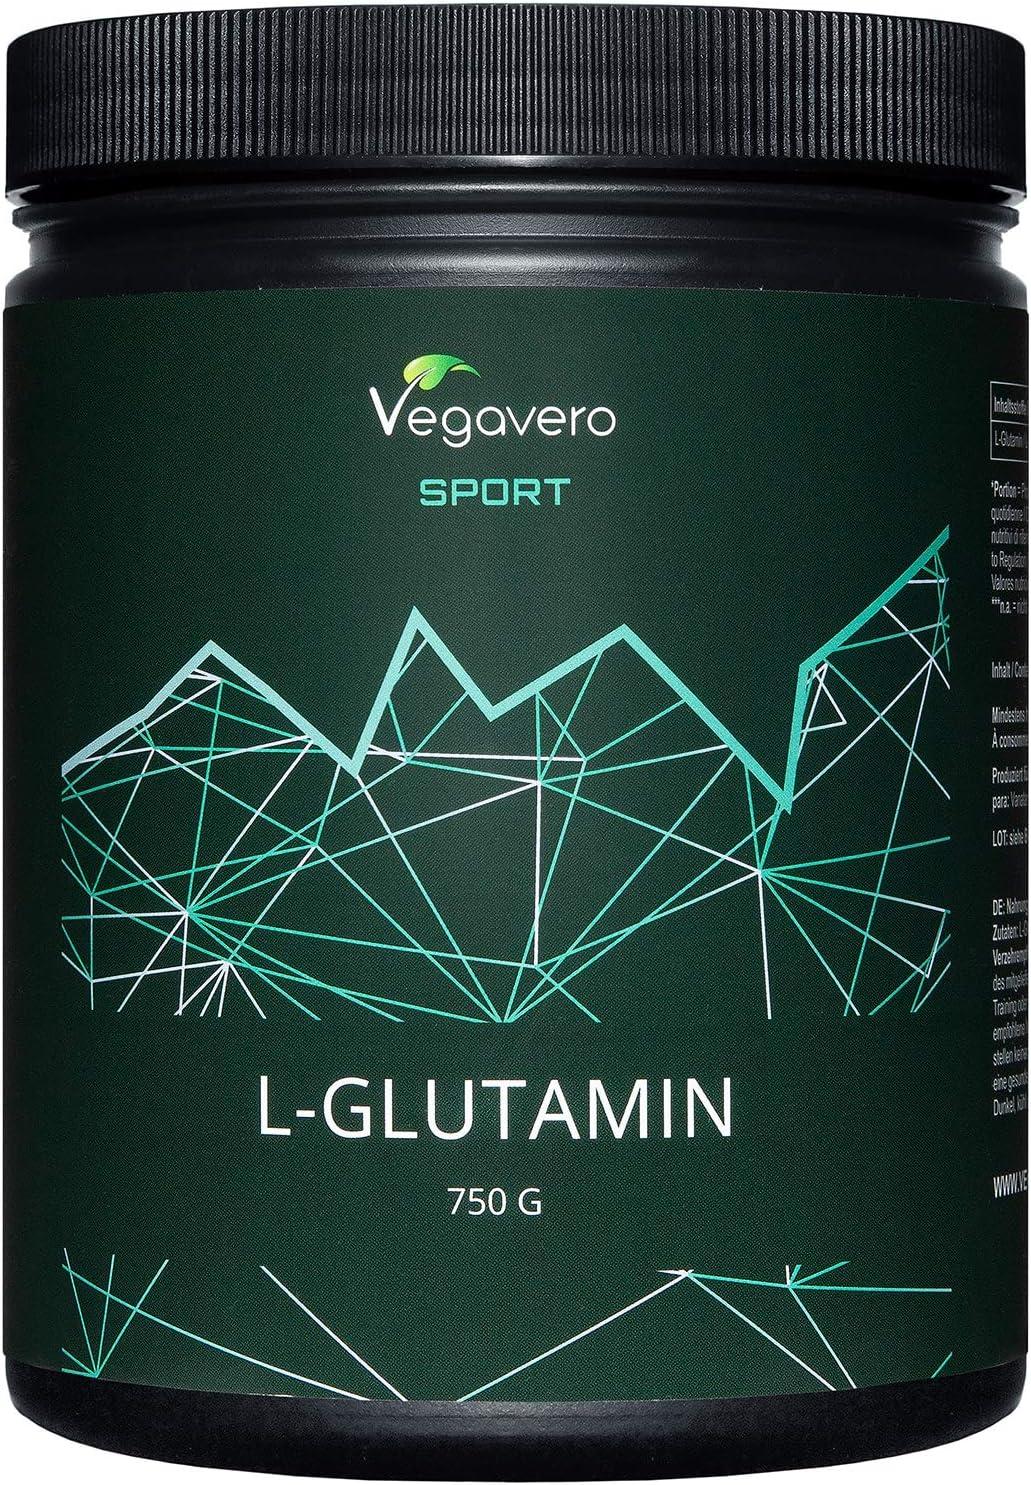 L-Glutamina Vegavero® Sport   PURA SIN ADITIVOS   750 g en Polvo   Post Entreno   Recuperador Muscular   Dolor Muscular + Agujetas   L Glutamine   ...